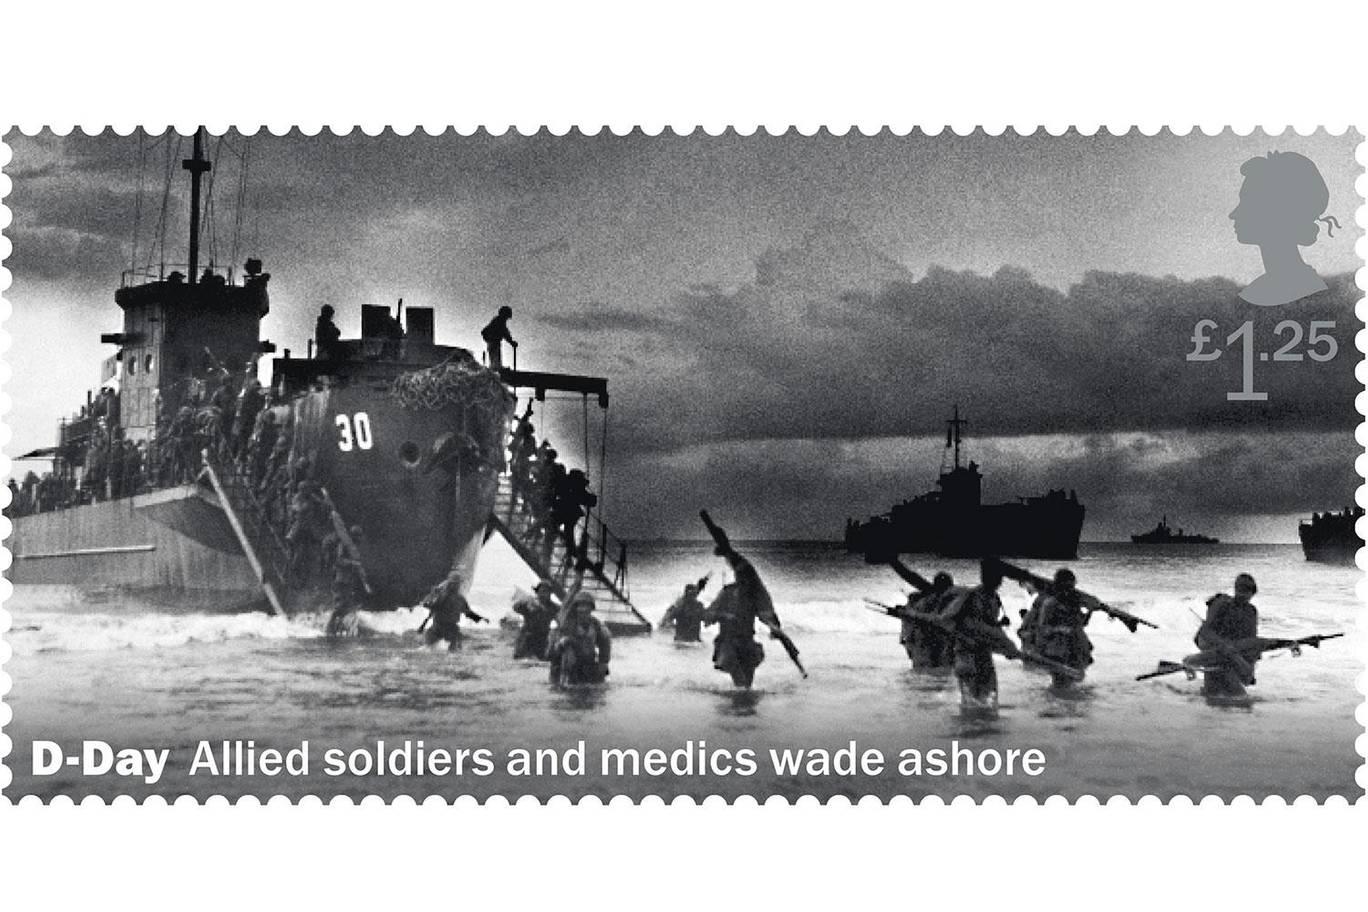 D-day Stamp Fail Dec 2018